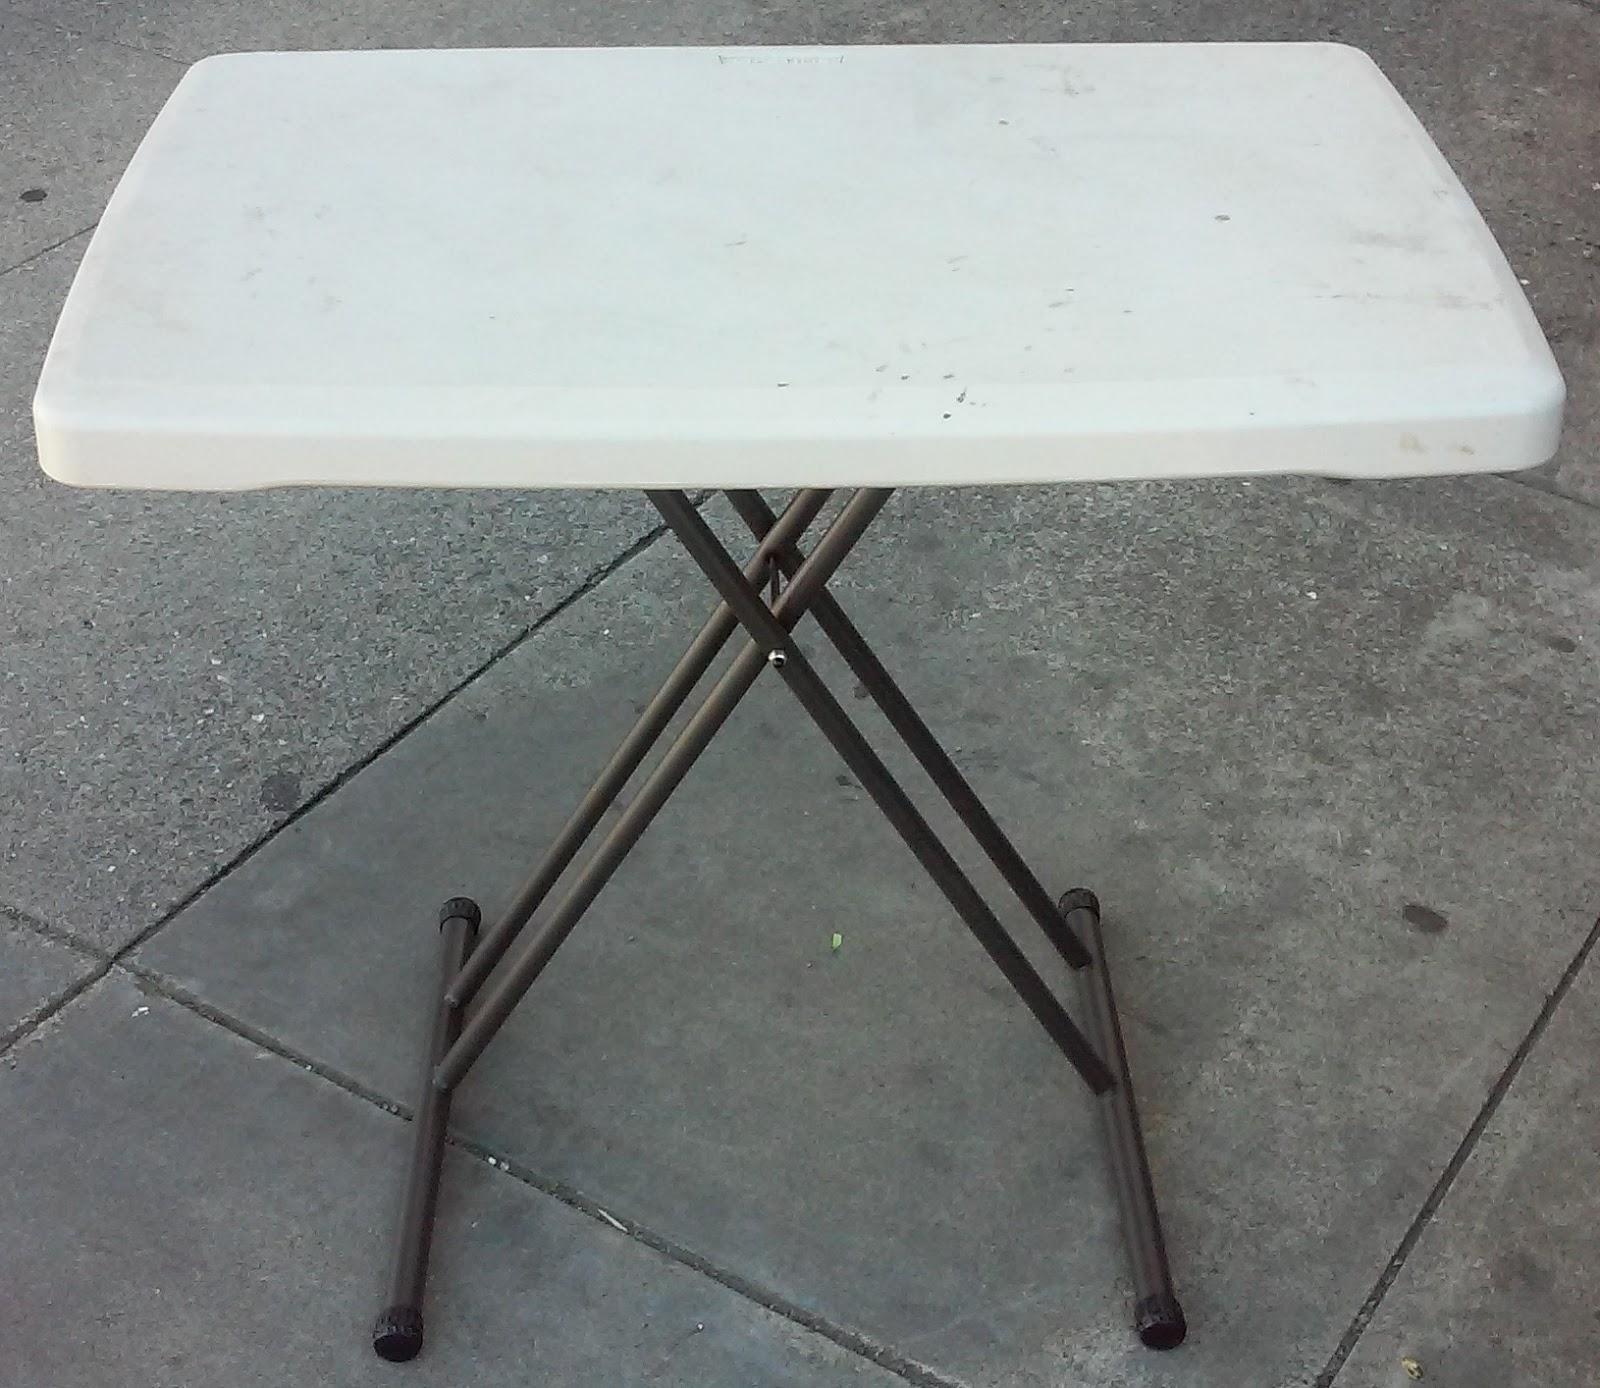 uhuru furniture collectibles sold lifetime 2 1 2 x 1 1 2